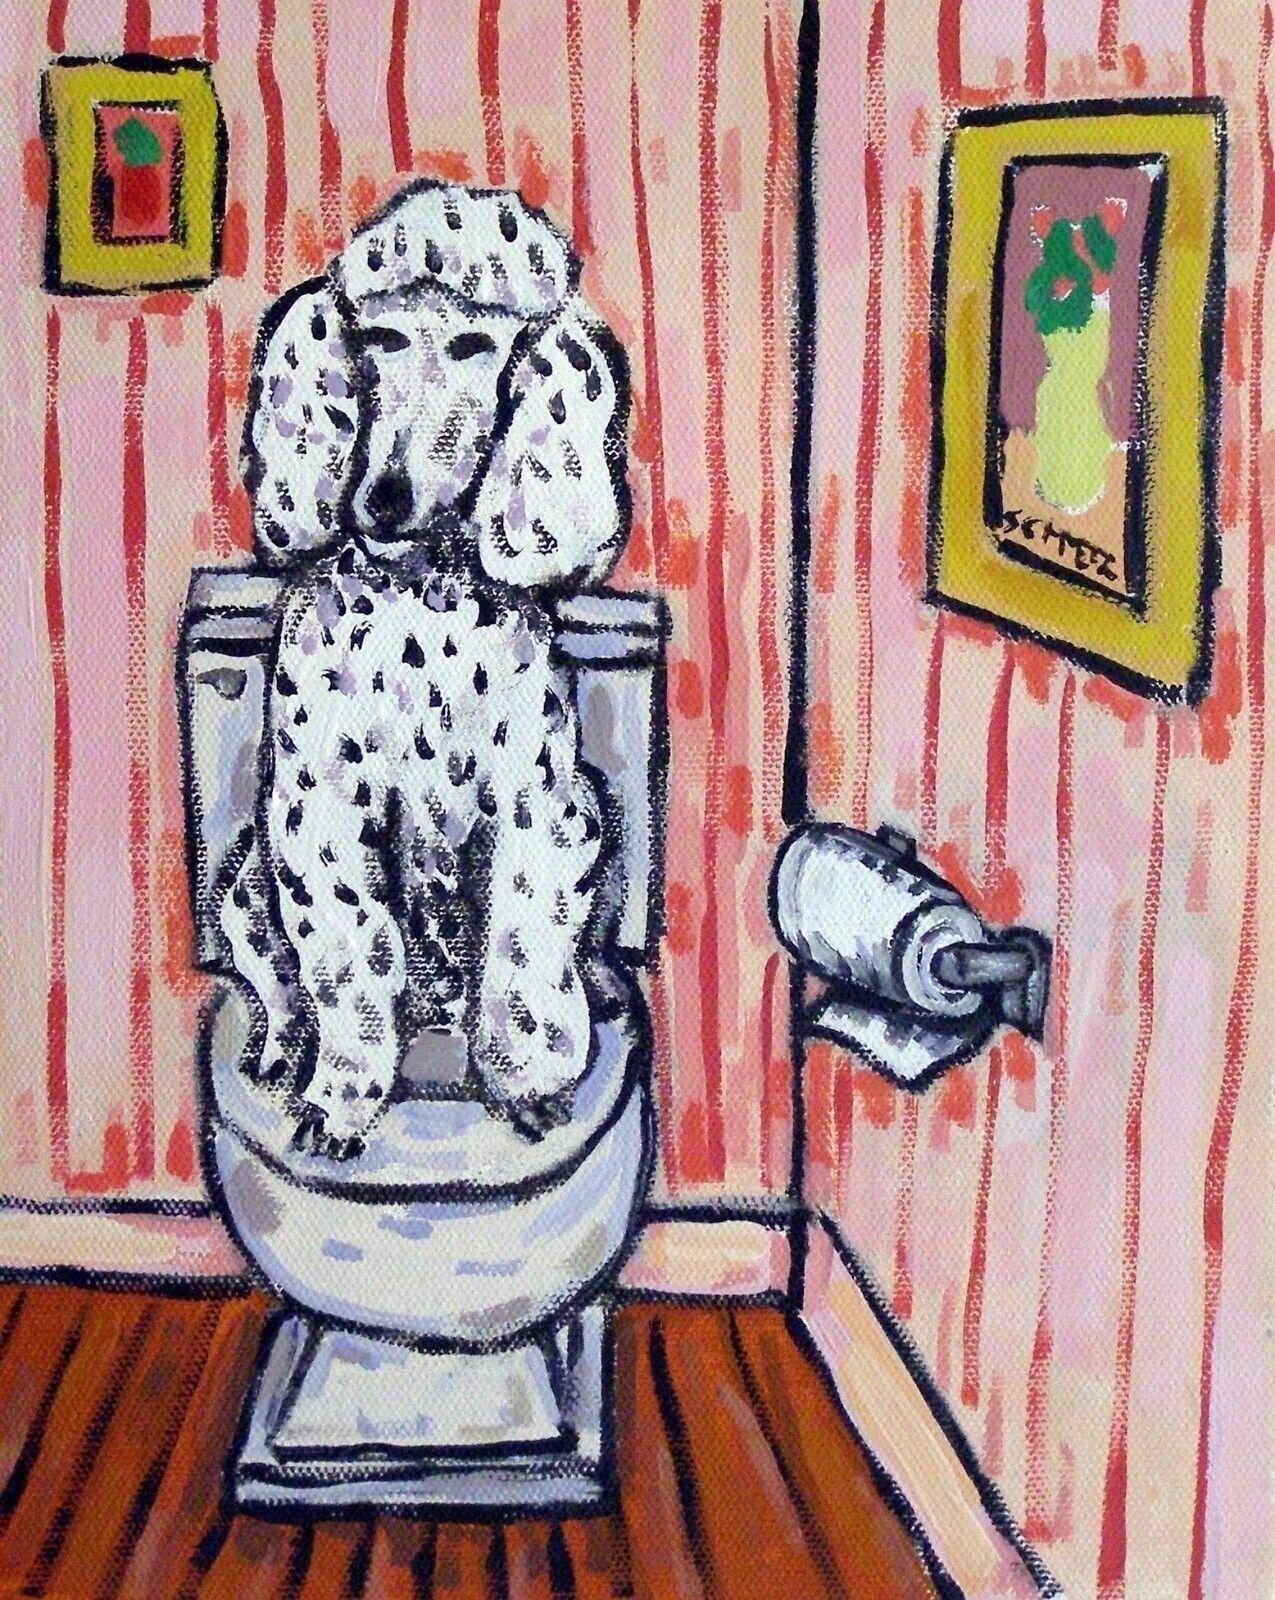 BLACK POODLE pet salon 8x10  art PRINT animals impressionism gift new